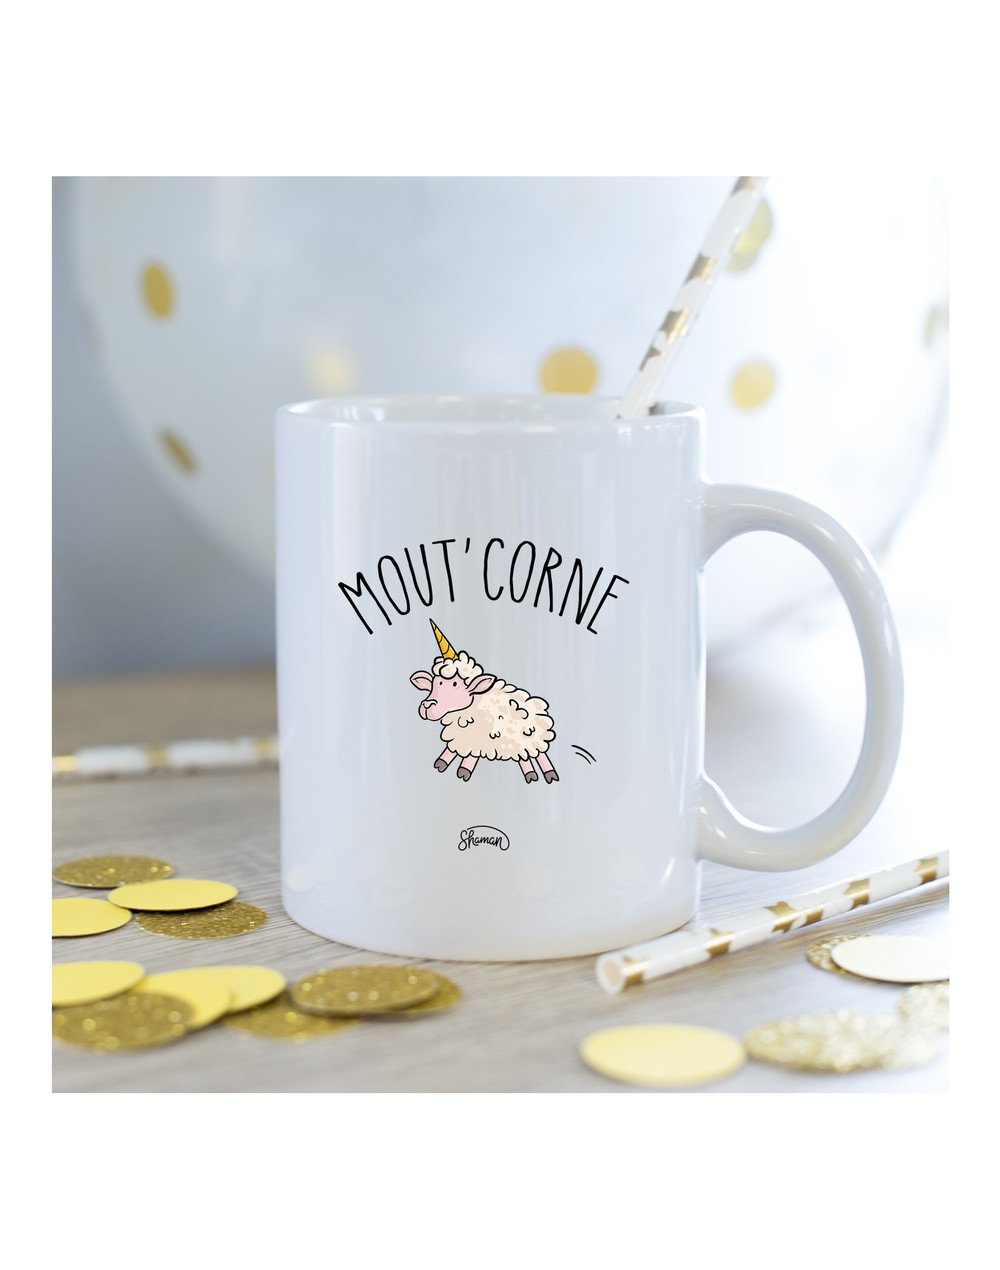 Mug Mout corne